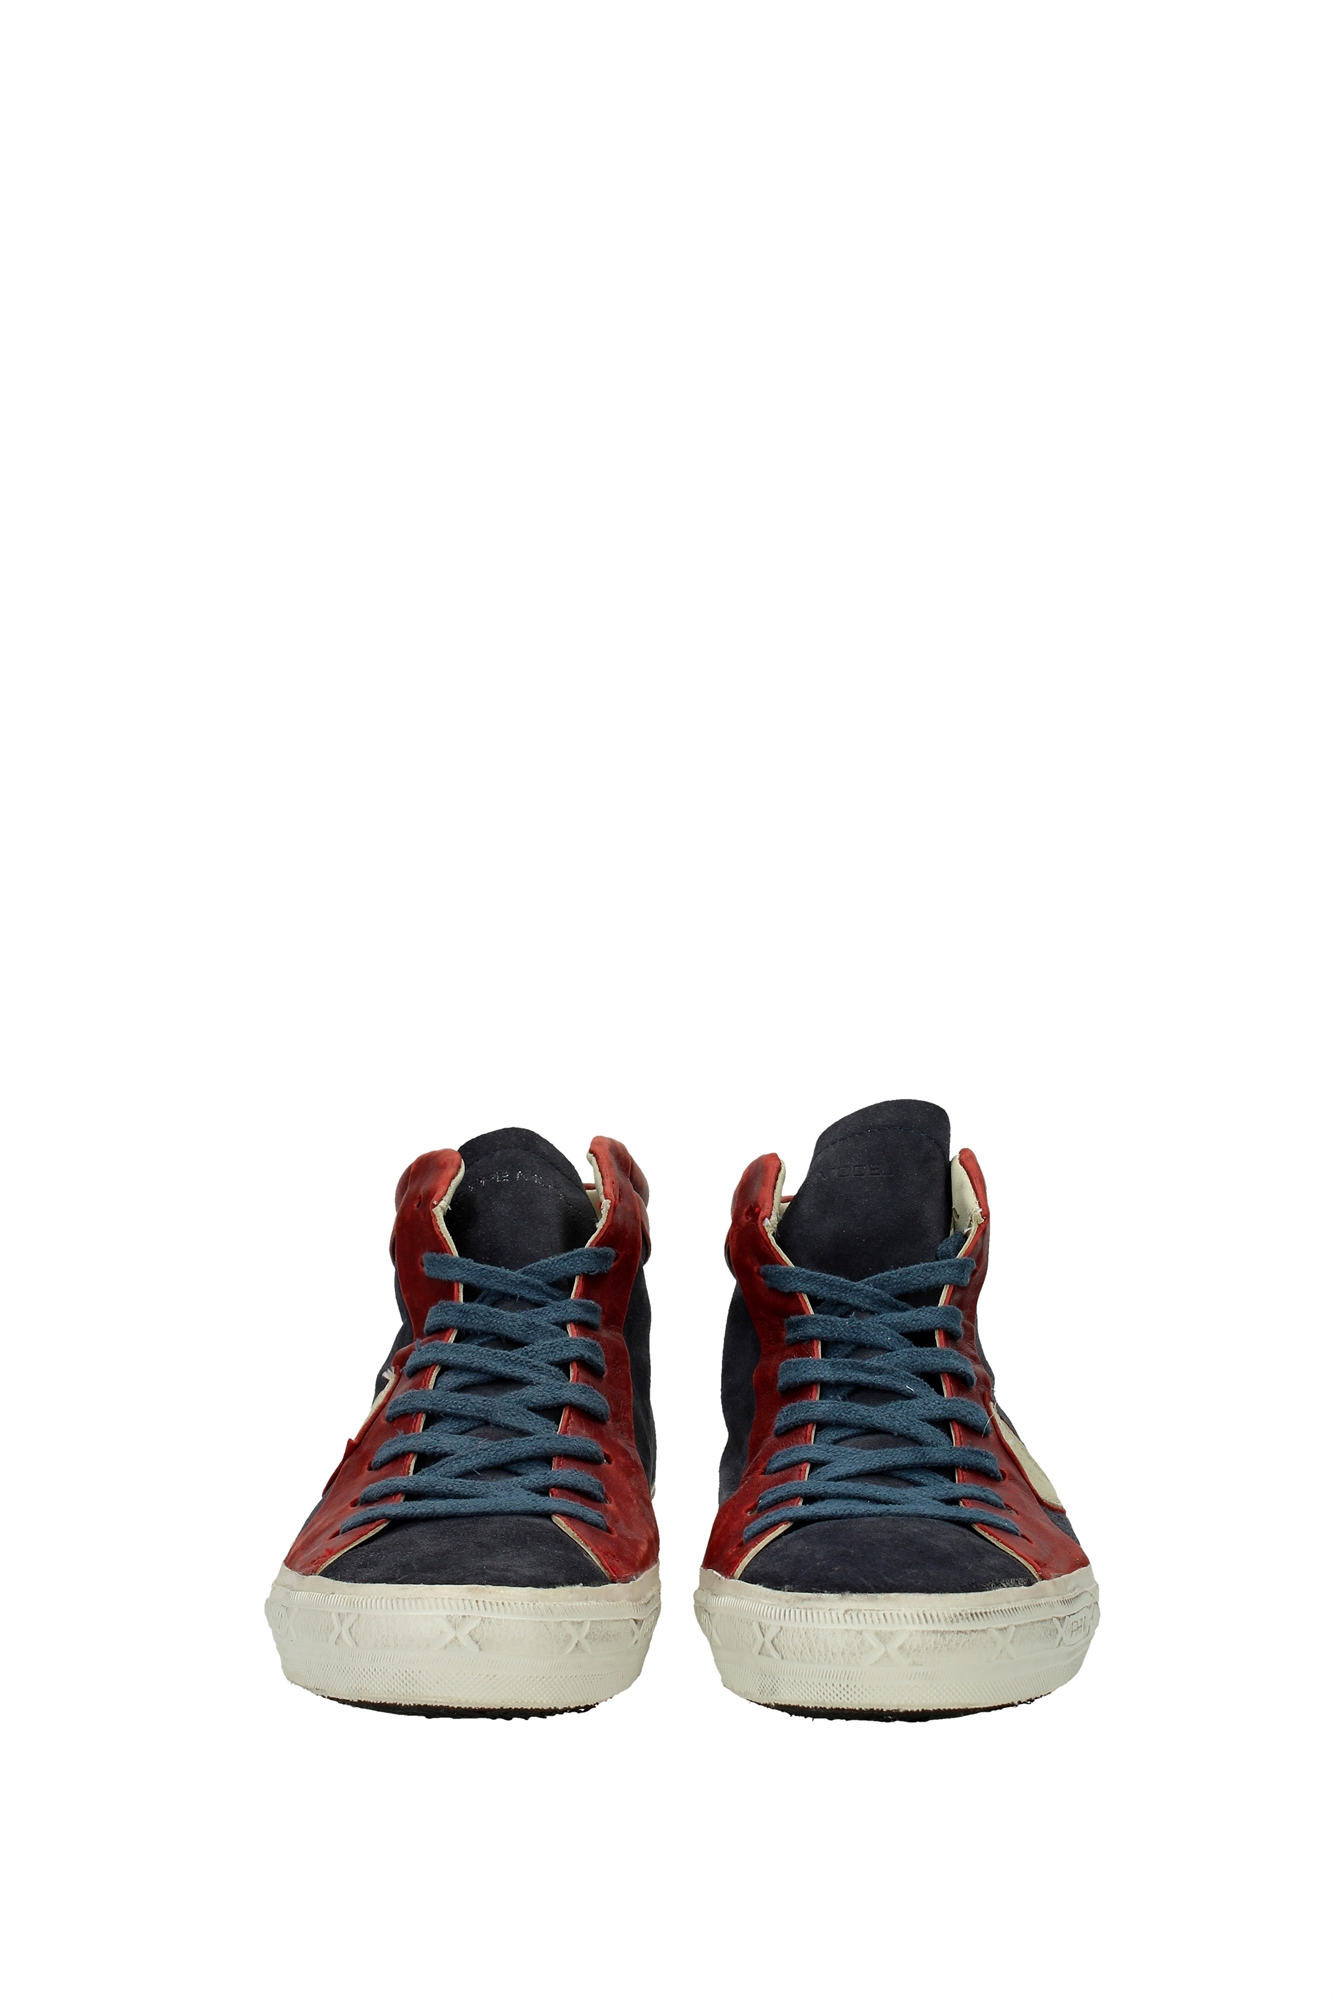 sneakers philippe model herren wildleder blau mdhuxs02 ebay. Black Bedroom Furniture Sets. Home Design Ideas